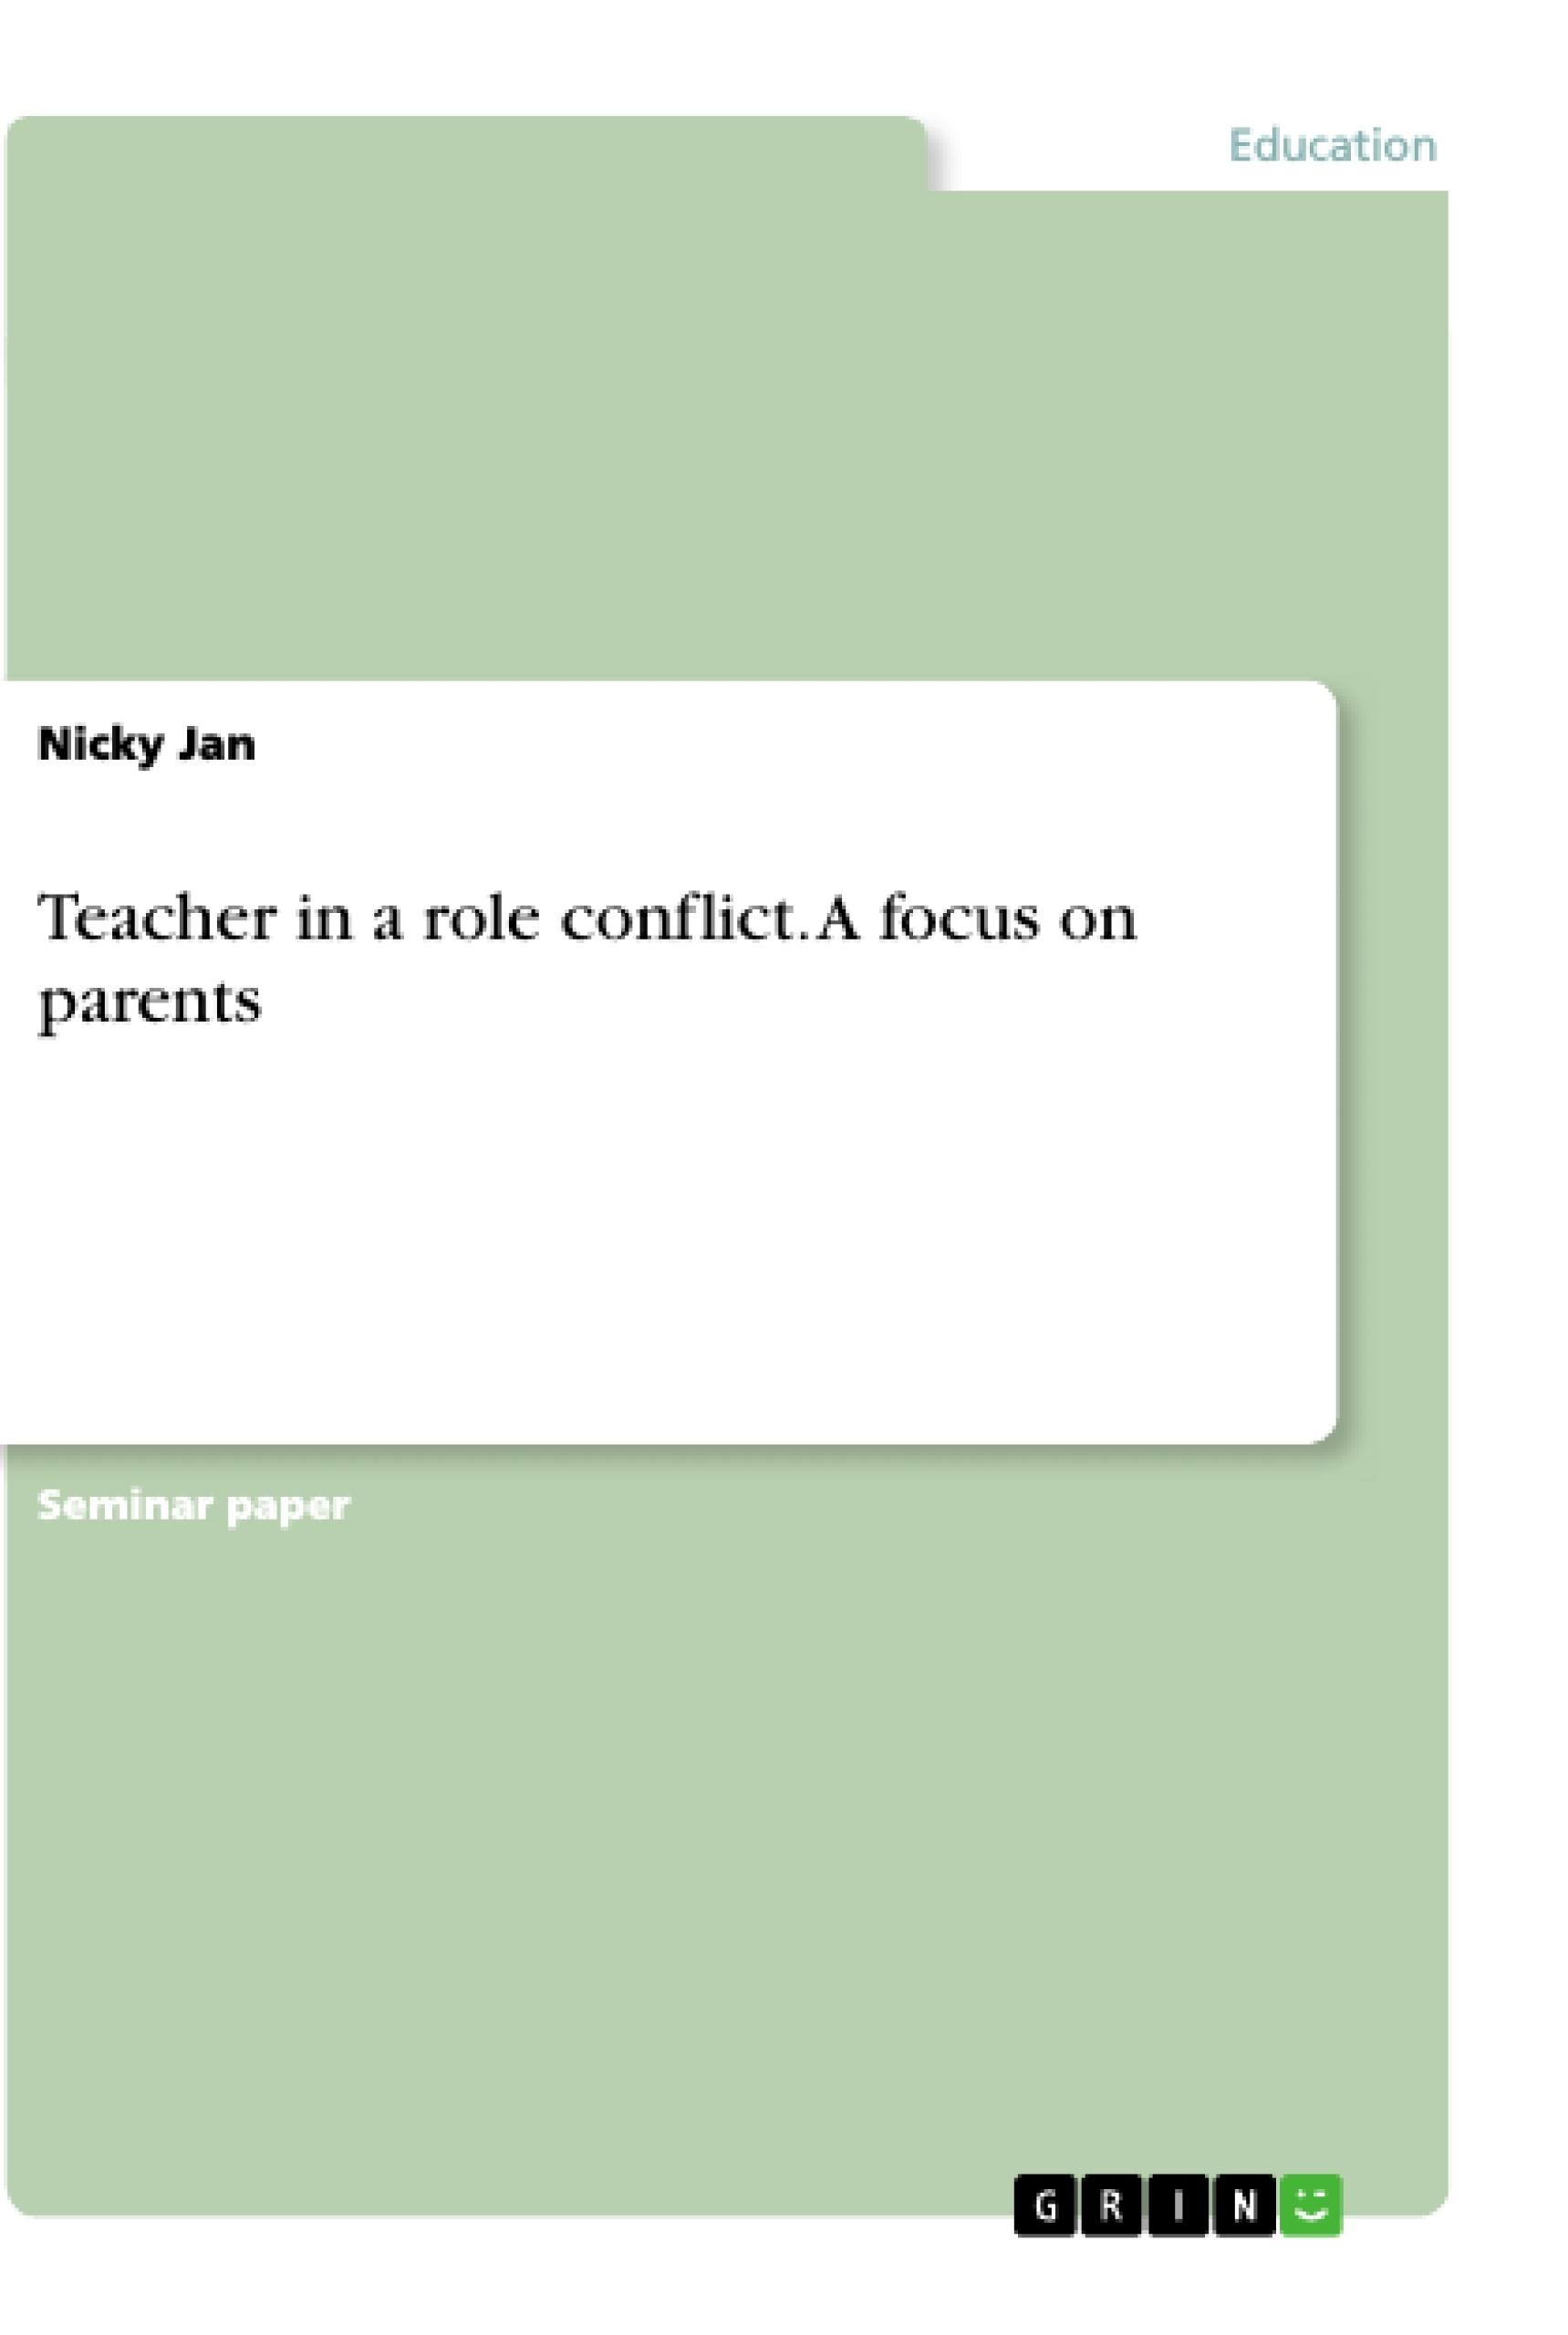 Title: Teacher in a role conflict. A focus on parents